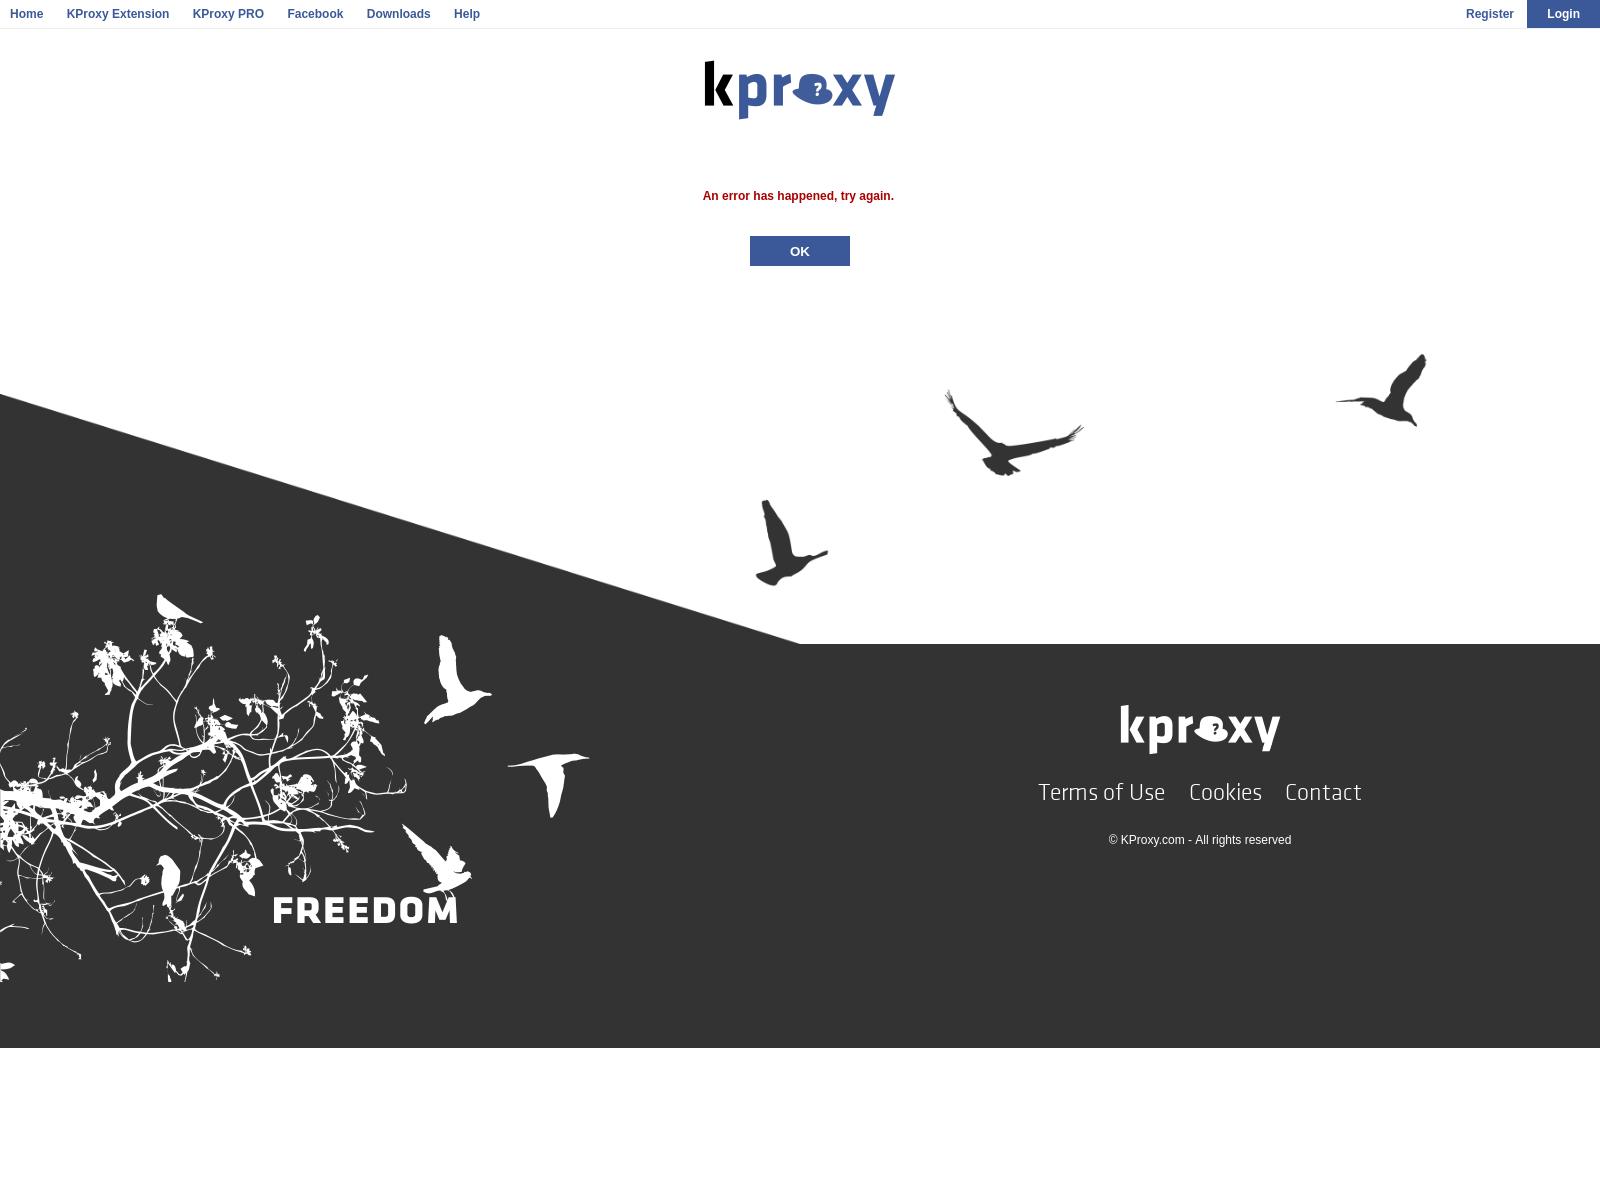 kproxy com - urlscan io